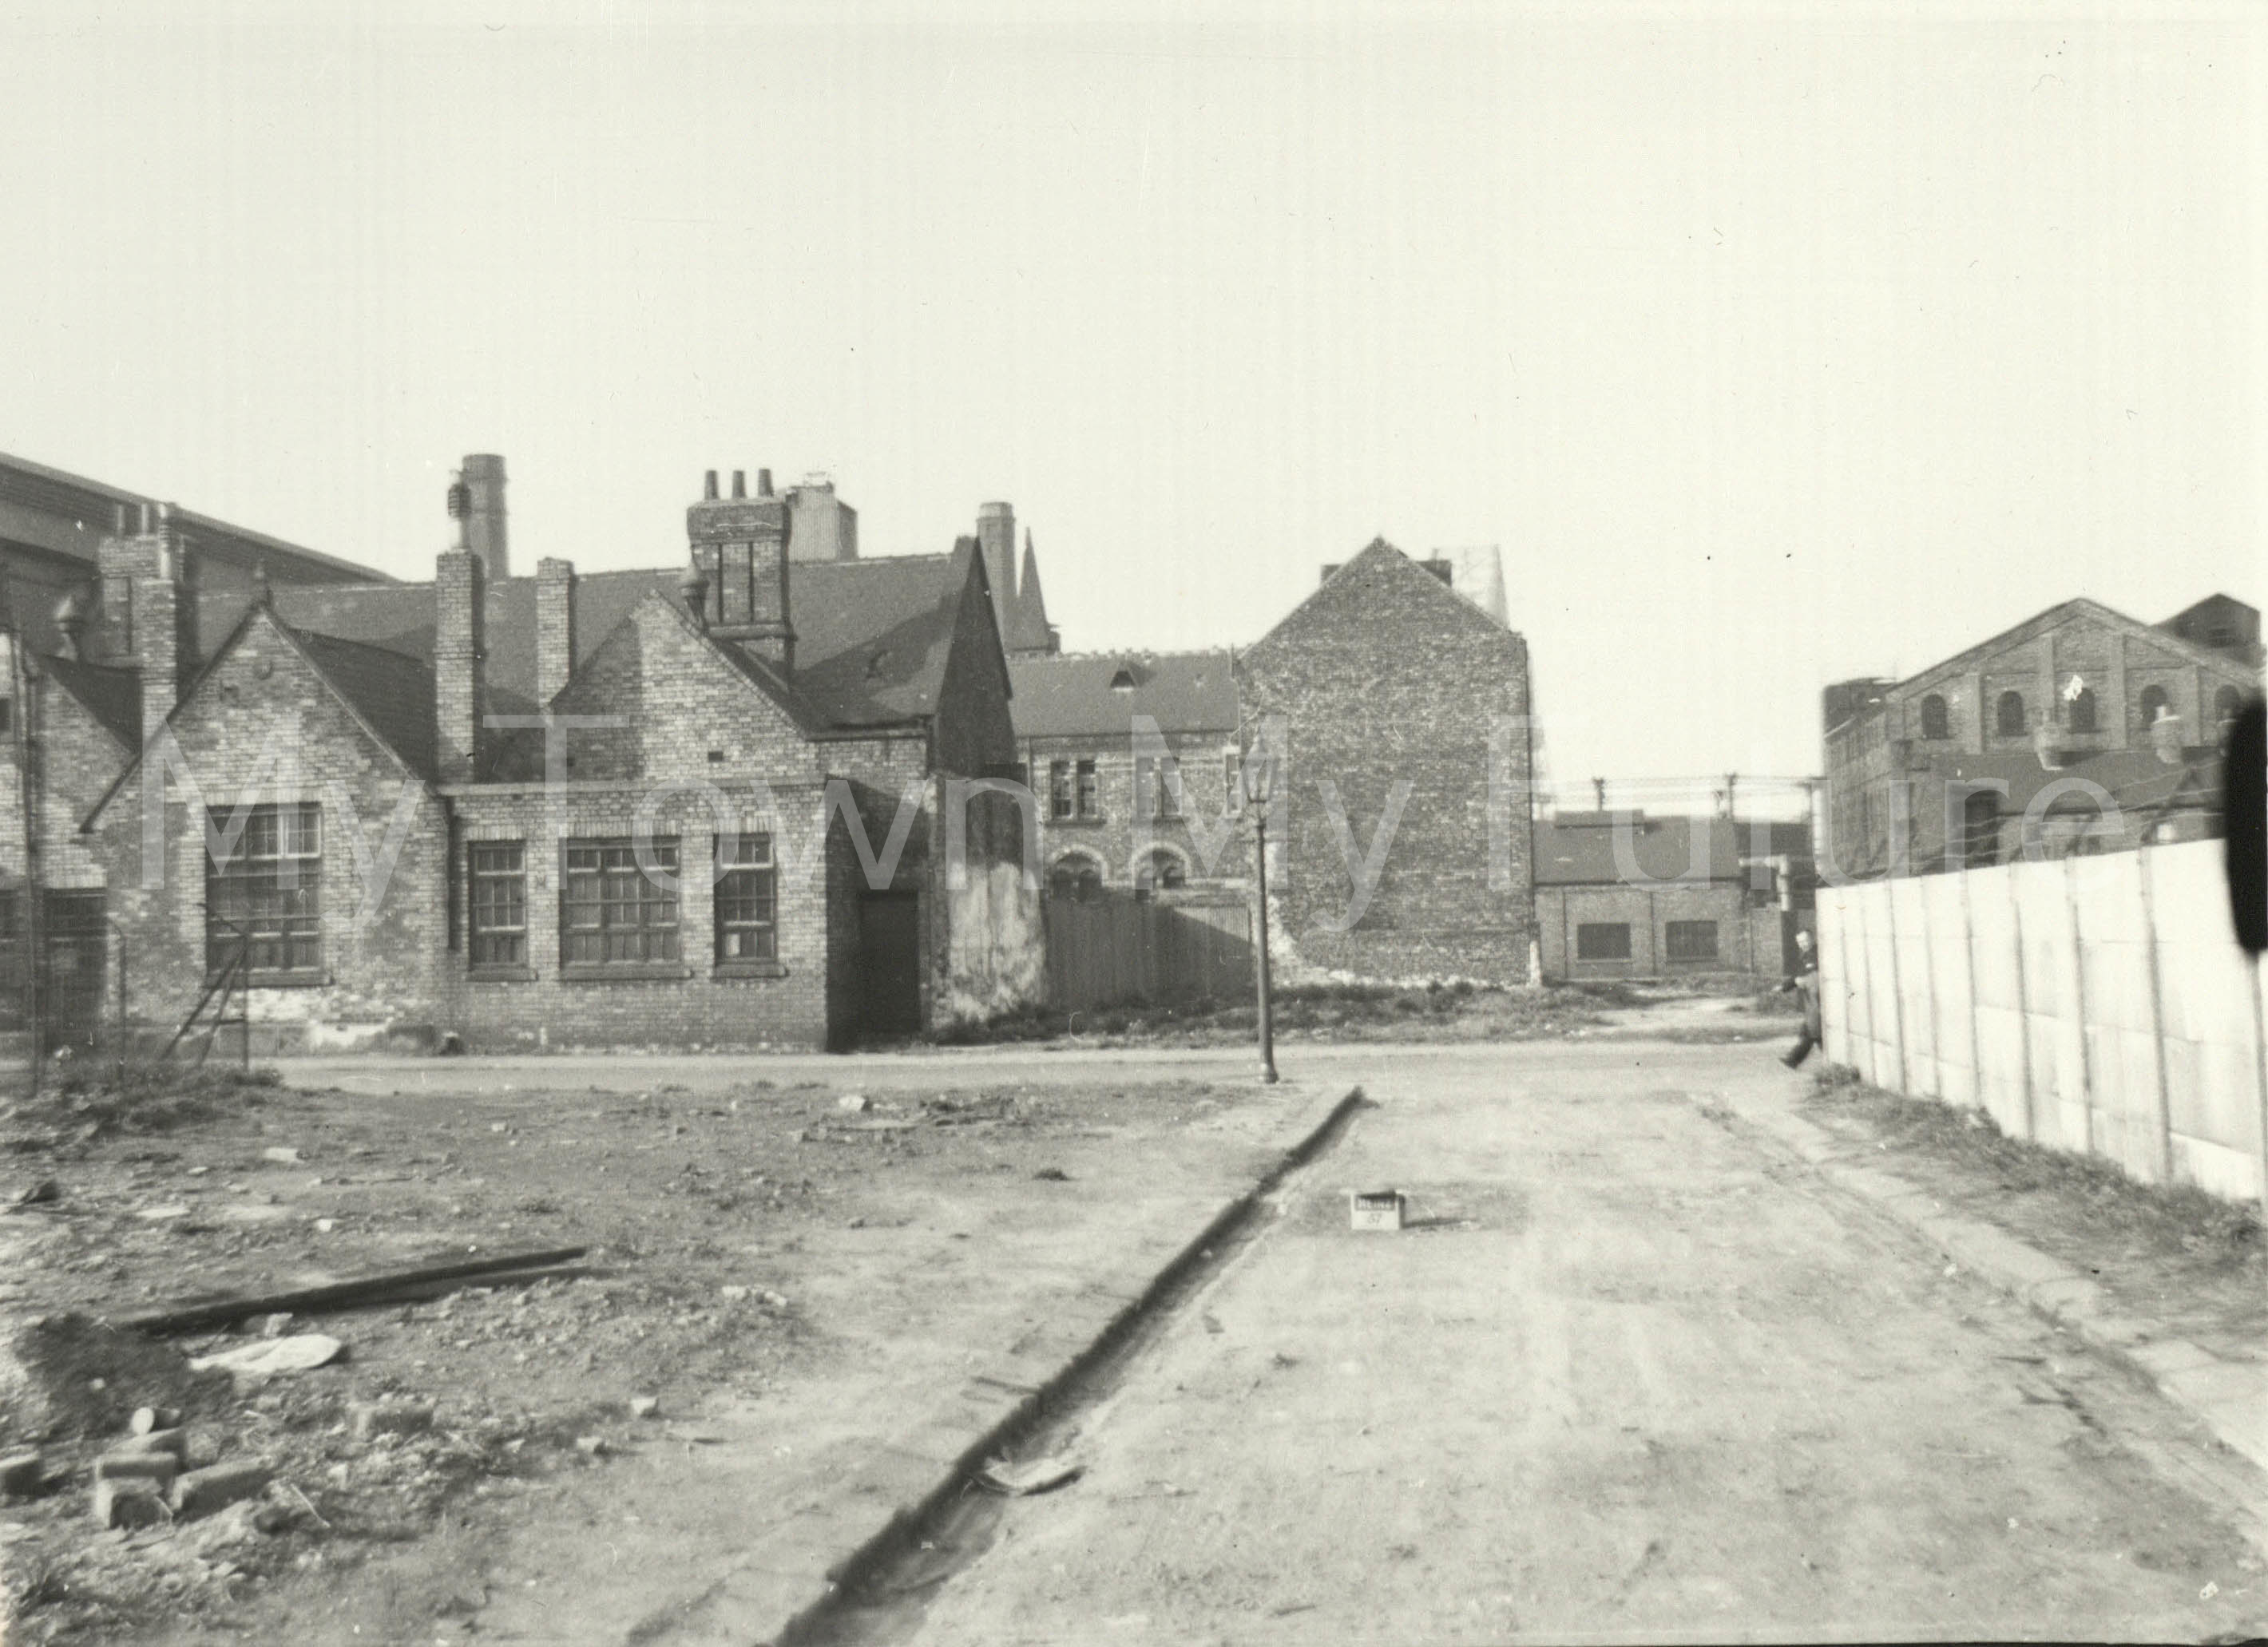 East Street School